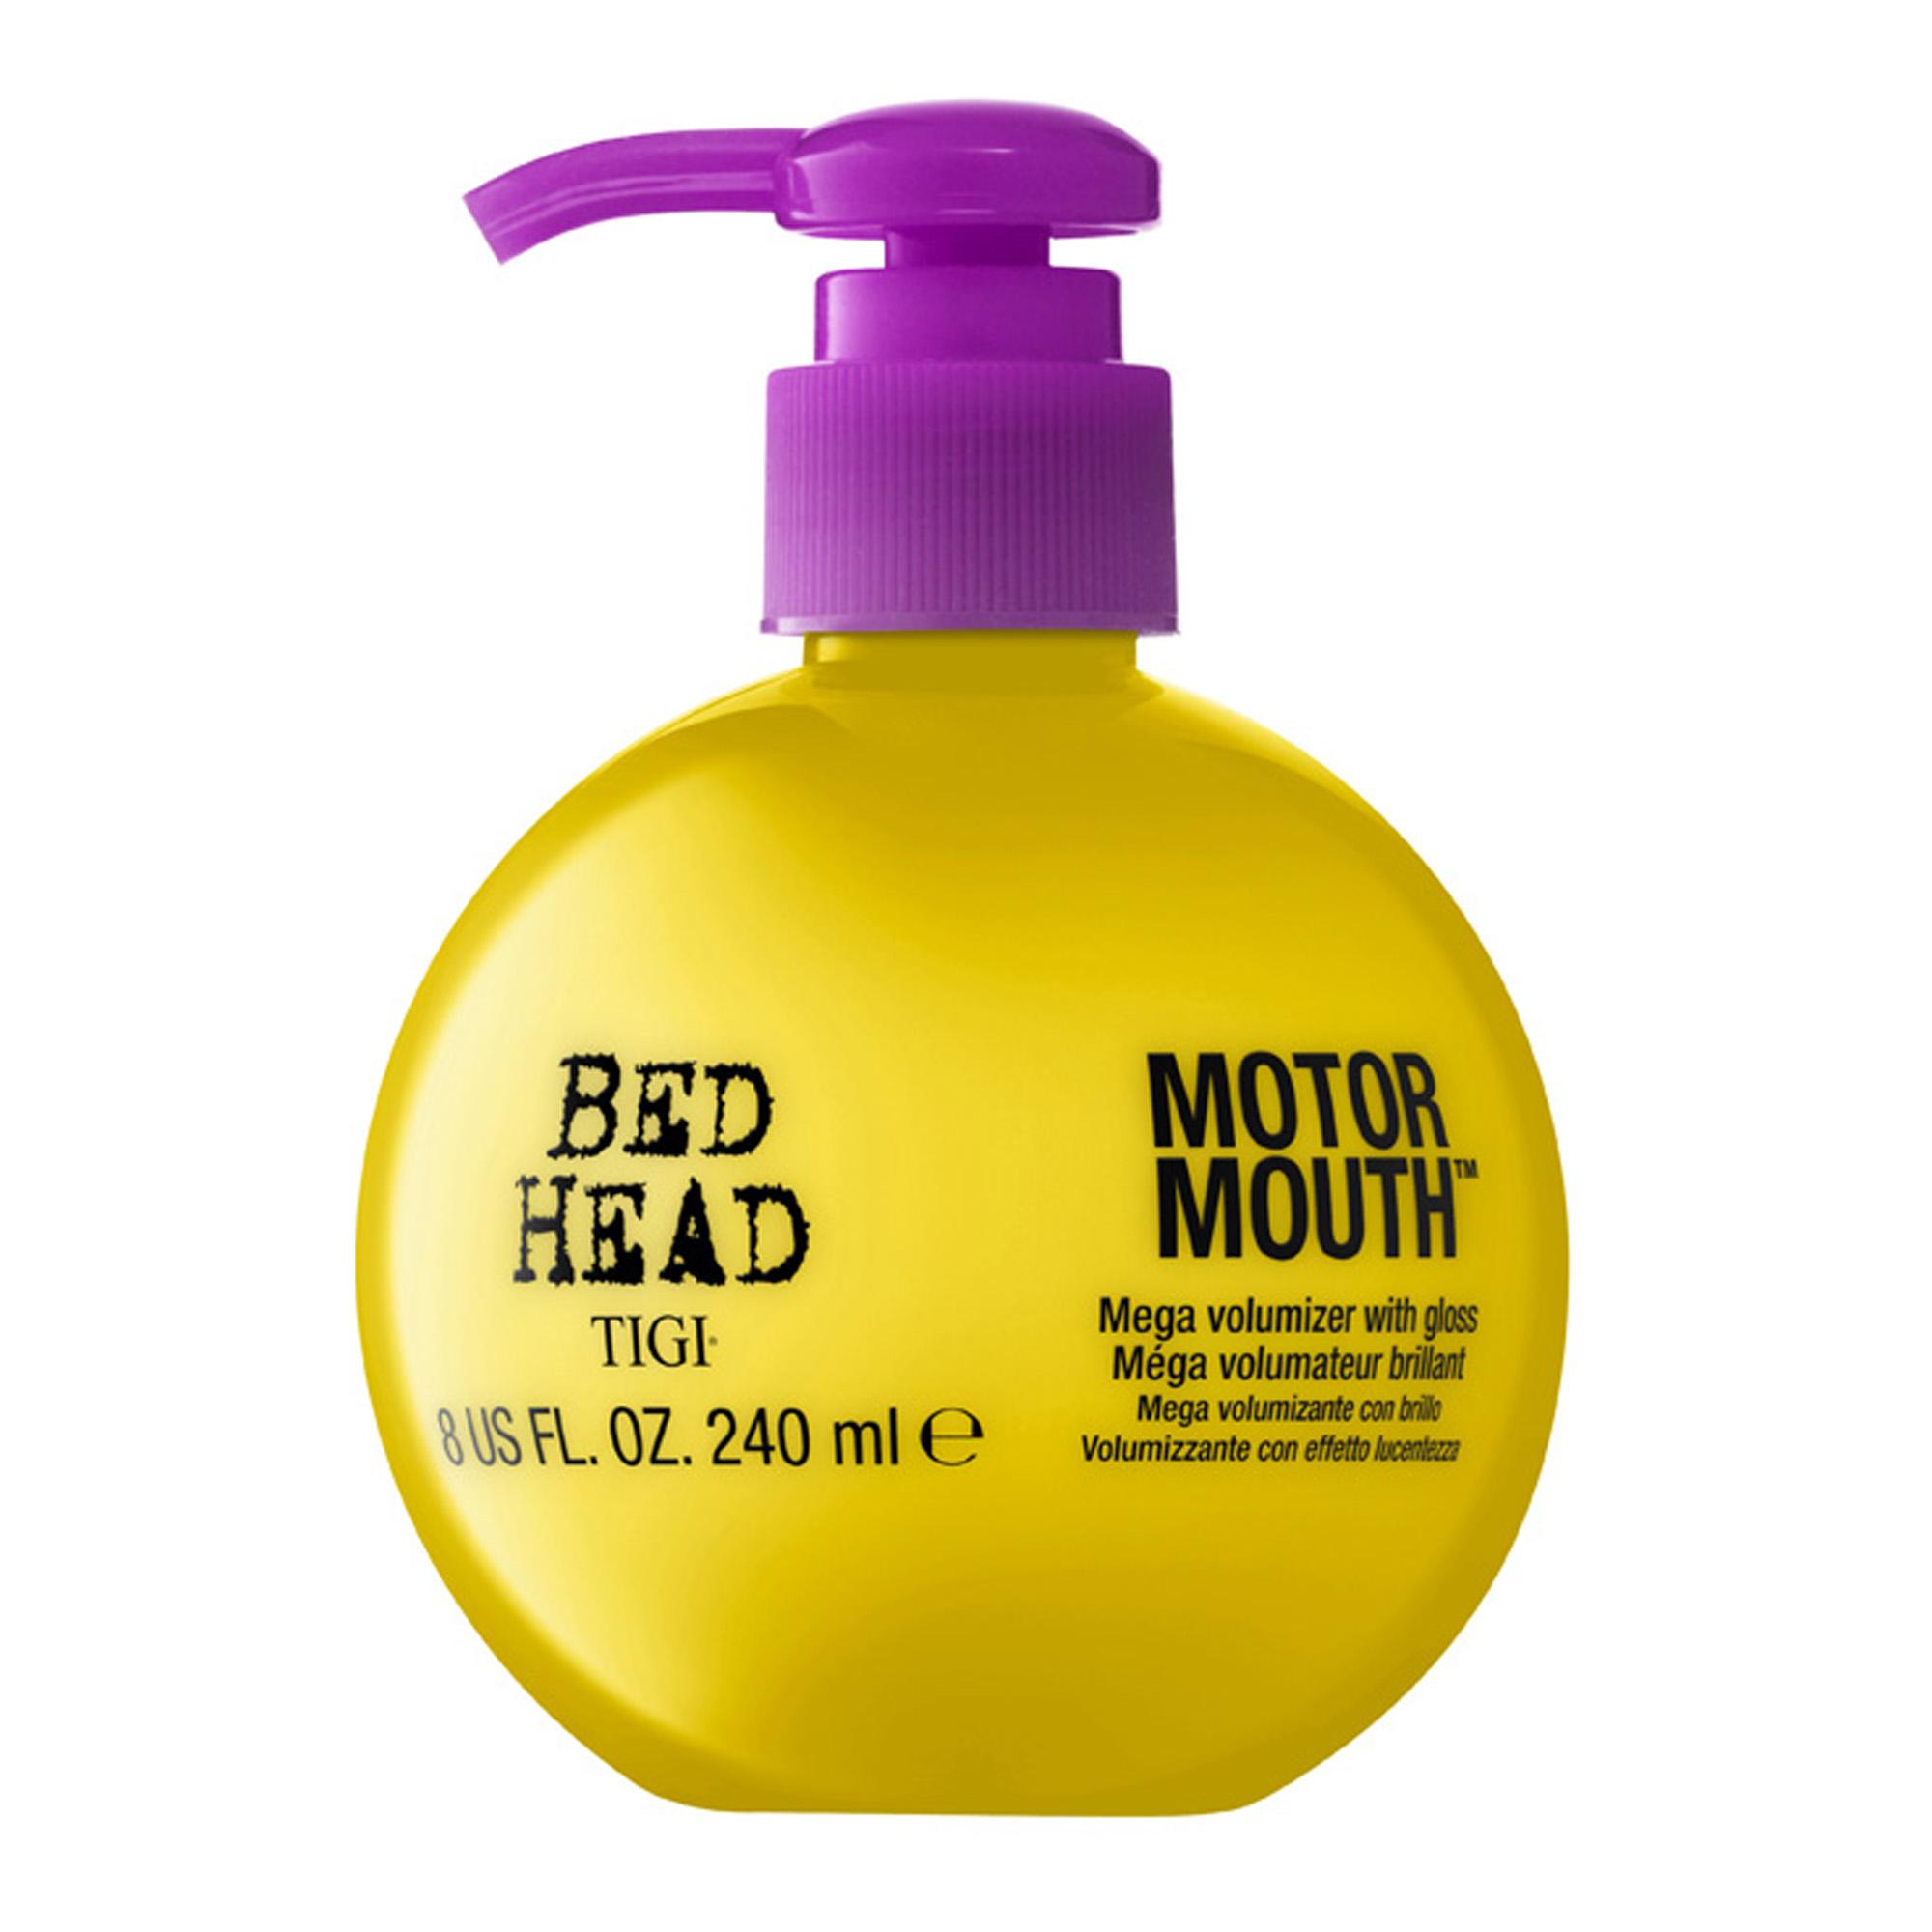 TIGI - Bed Head Motor Mouth Volume Cream 240 ml